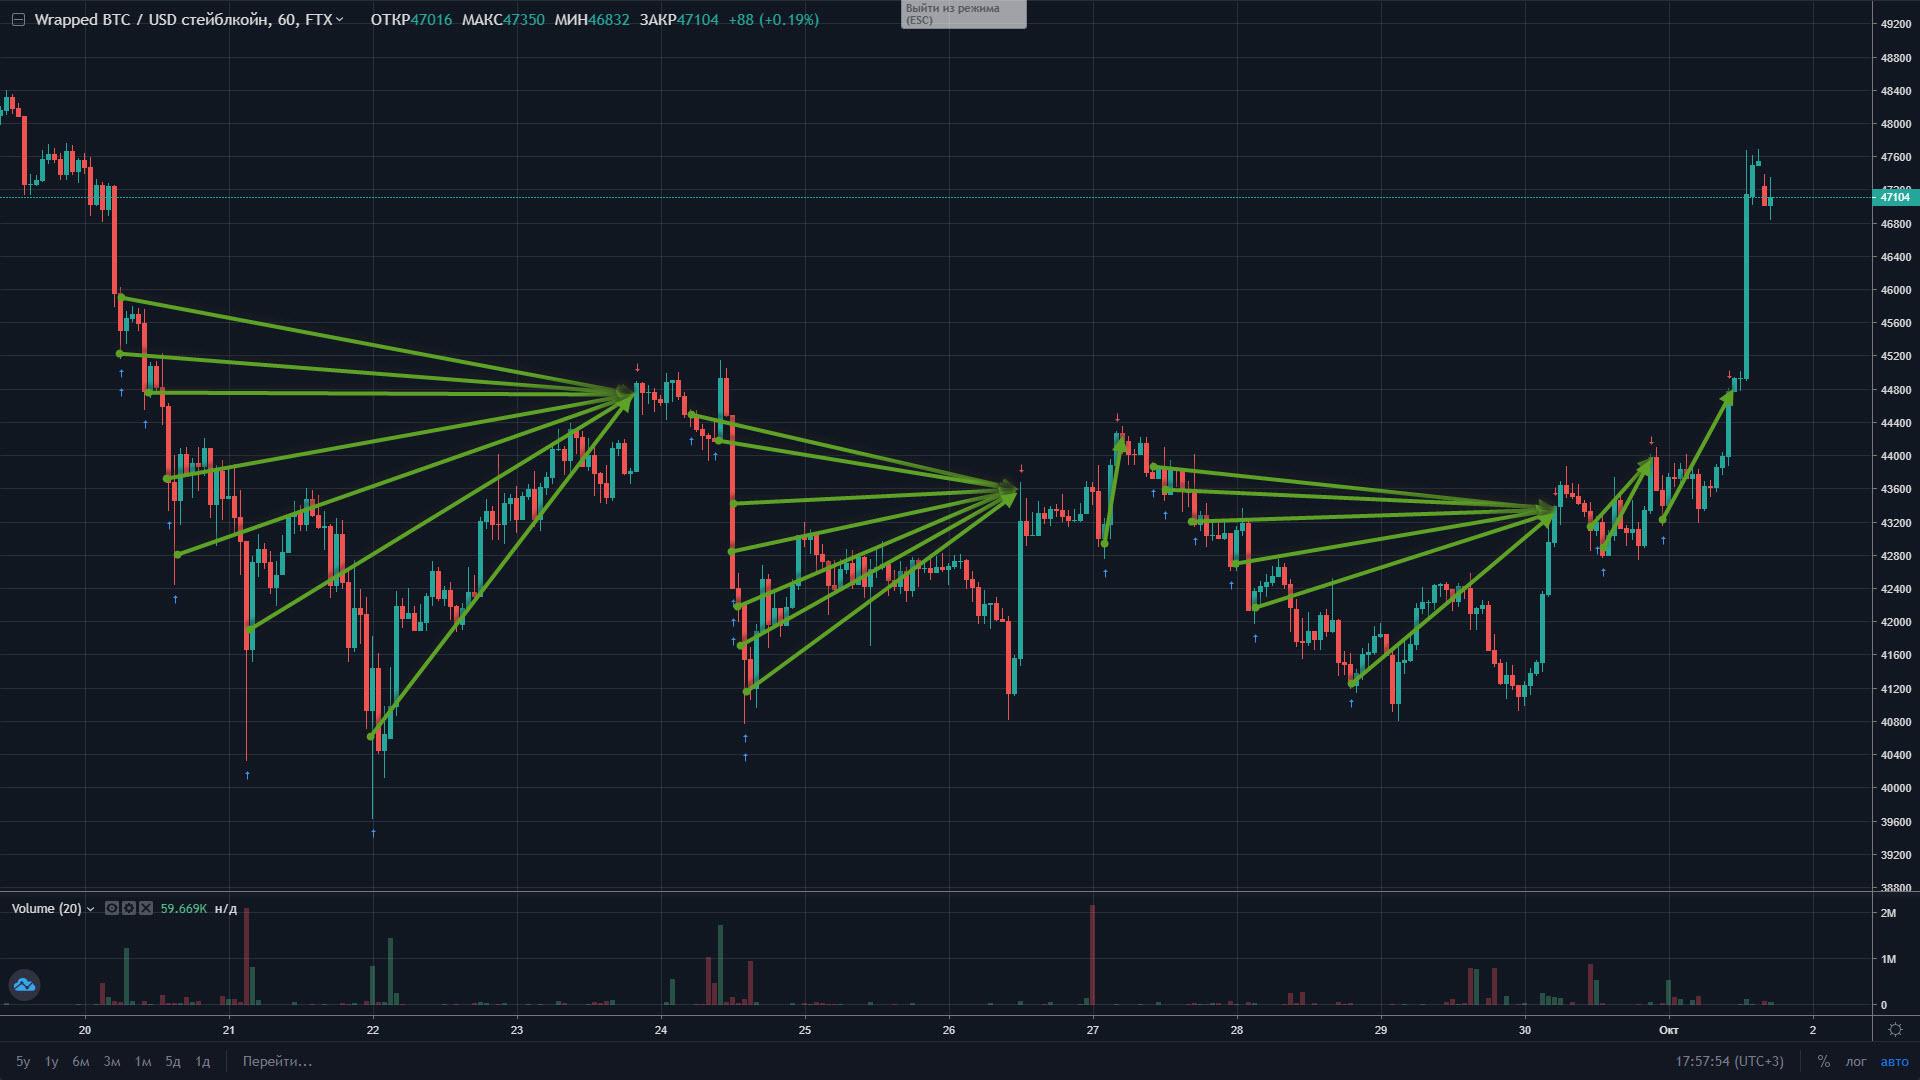 WBTC_USDT - crypto speculant FTX